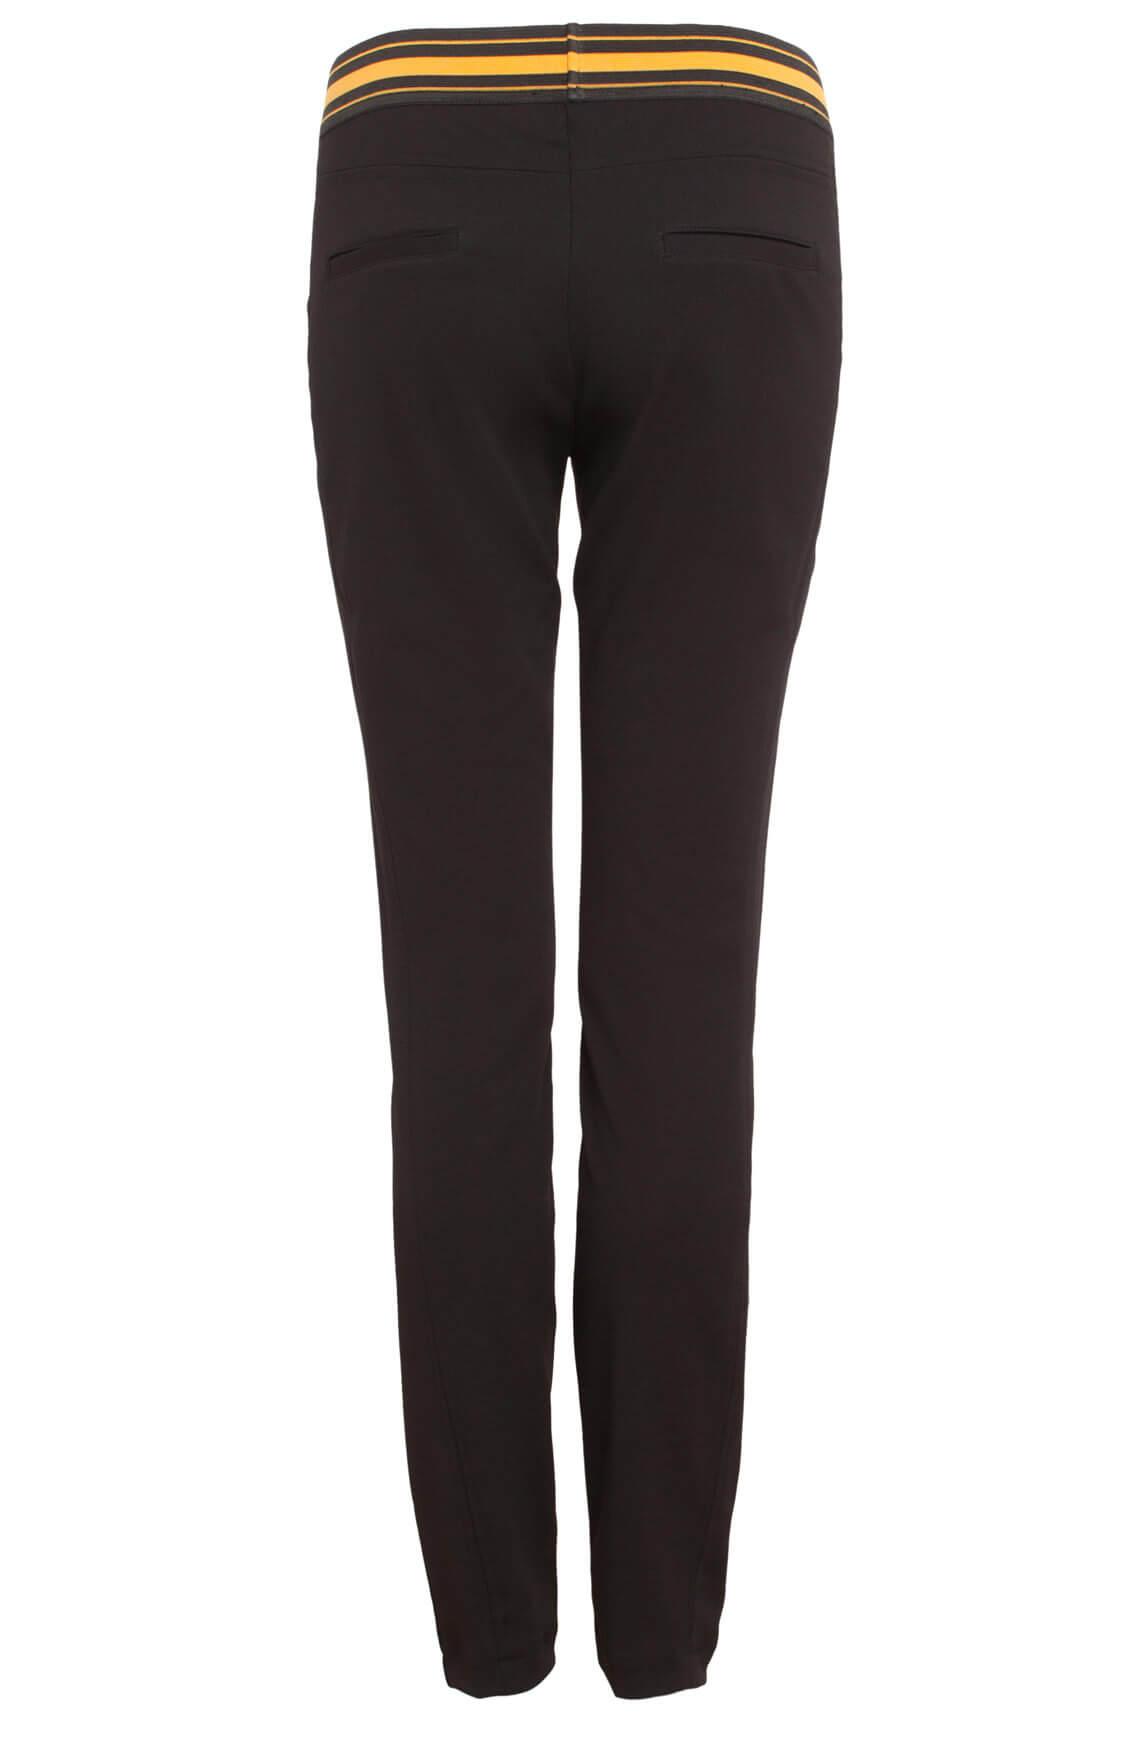 Anna Dames Pantalon met bies zwart